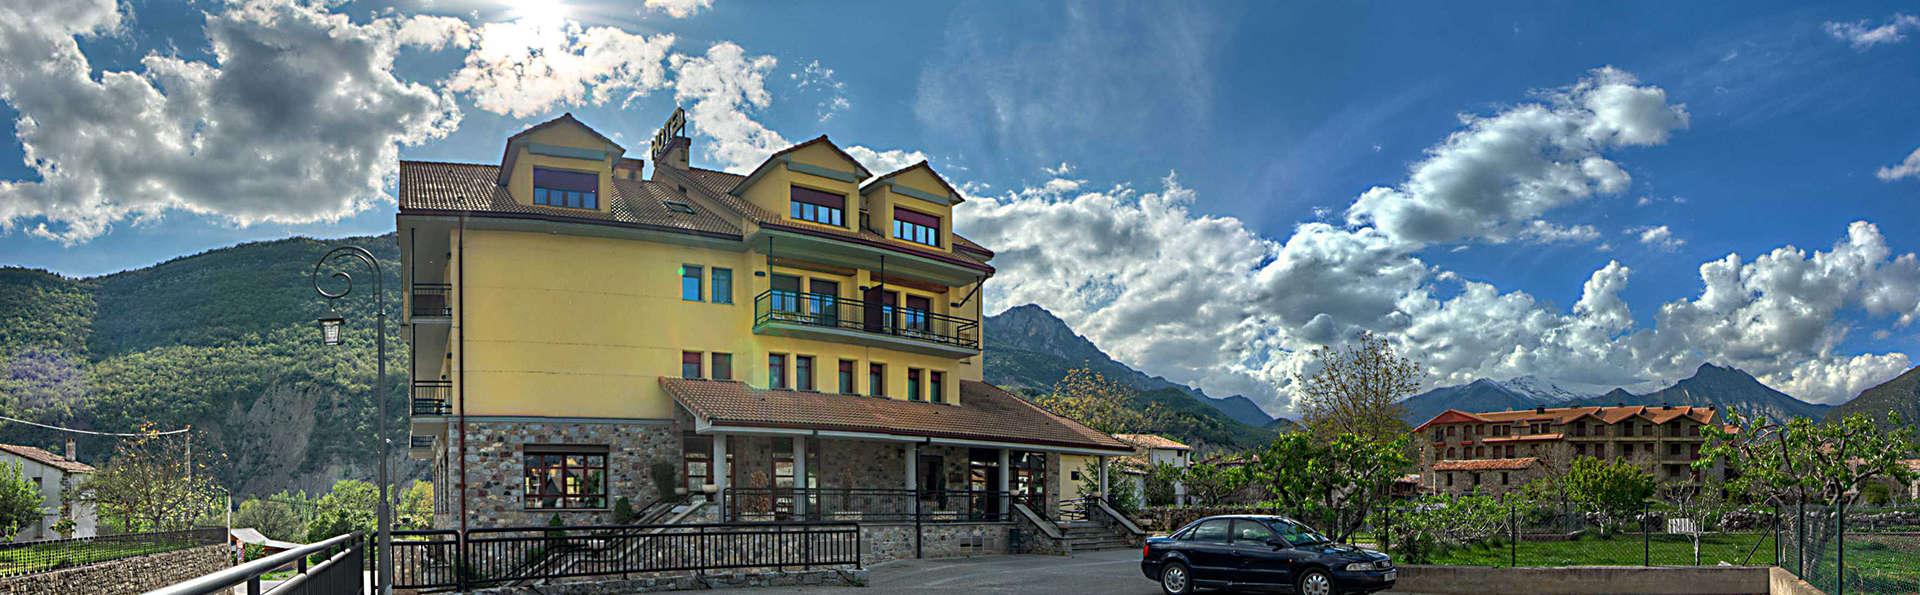 Hotel Cotiella - EDIT_front1.jpg